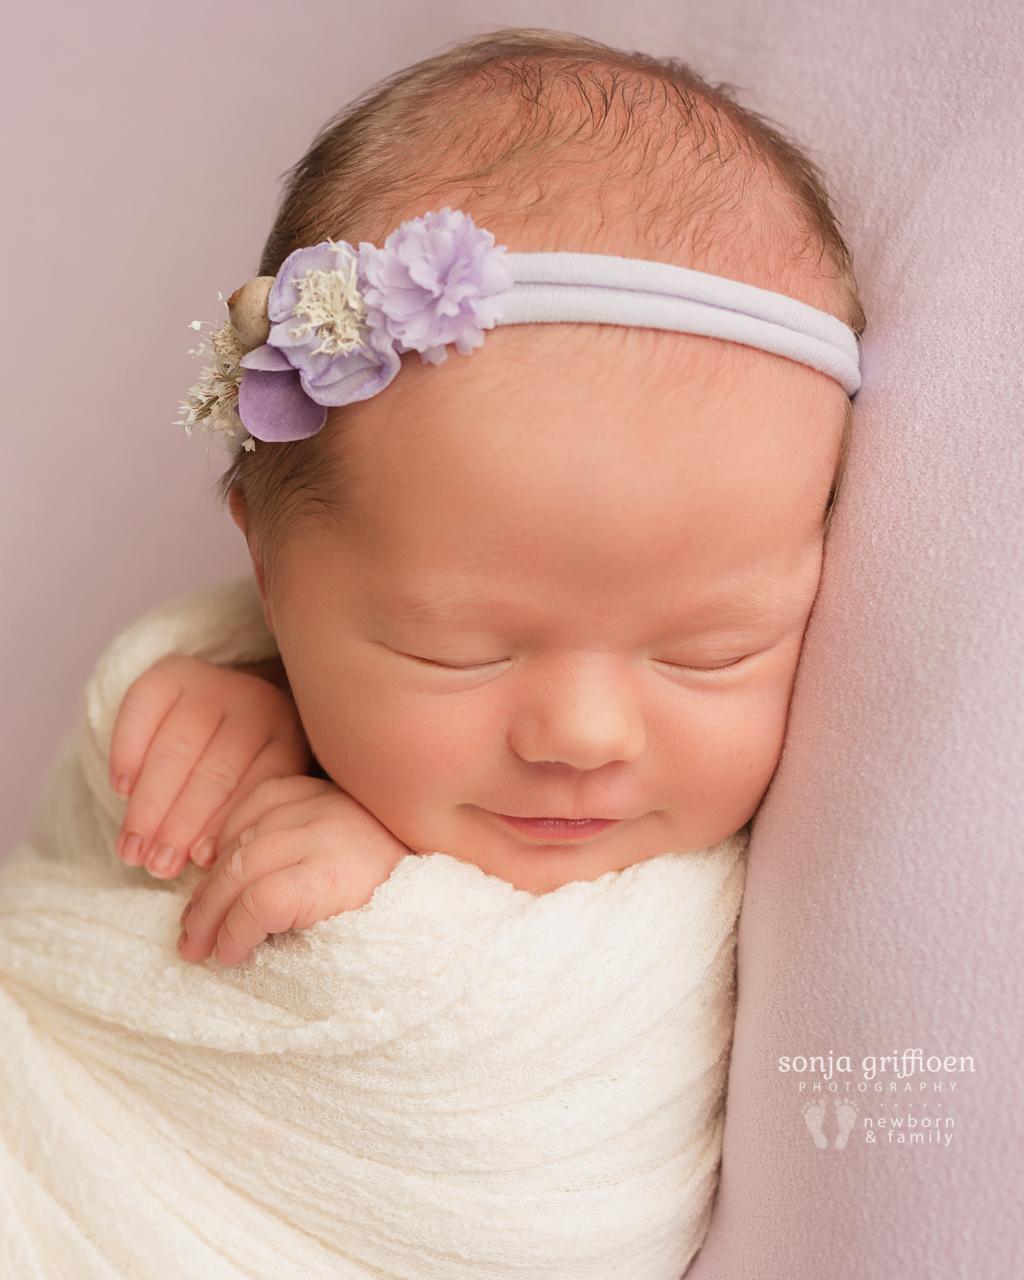 Asher-Newborn-Brisbane-Newborn-Photographer-Sonja-Griffioen-02.jpg